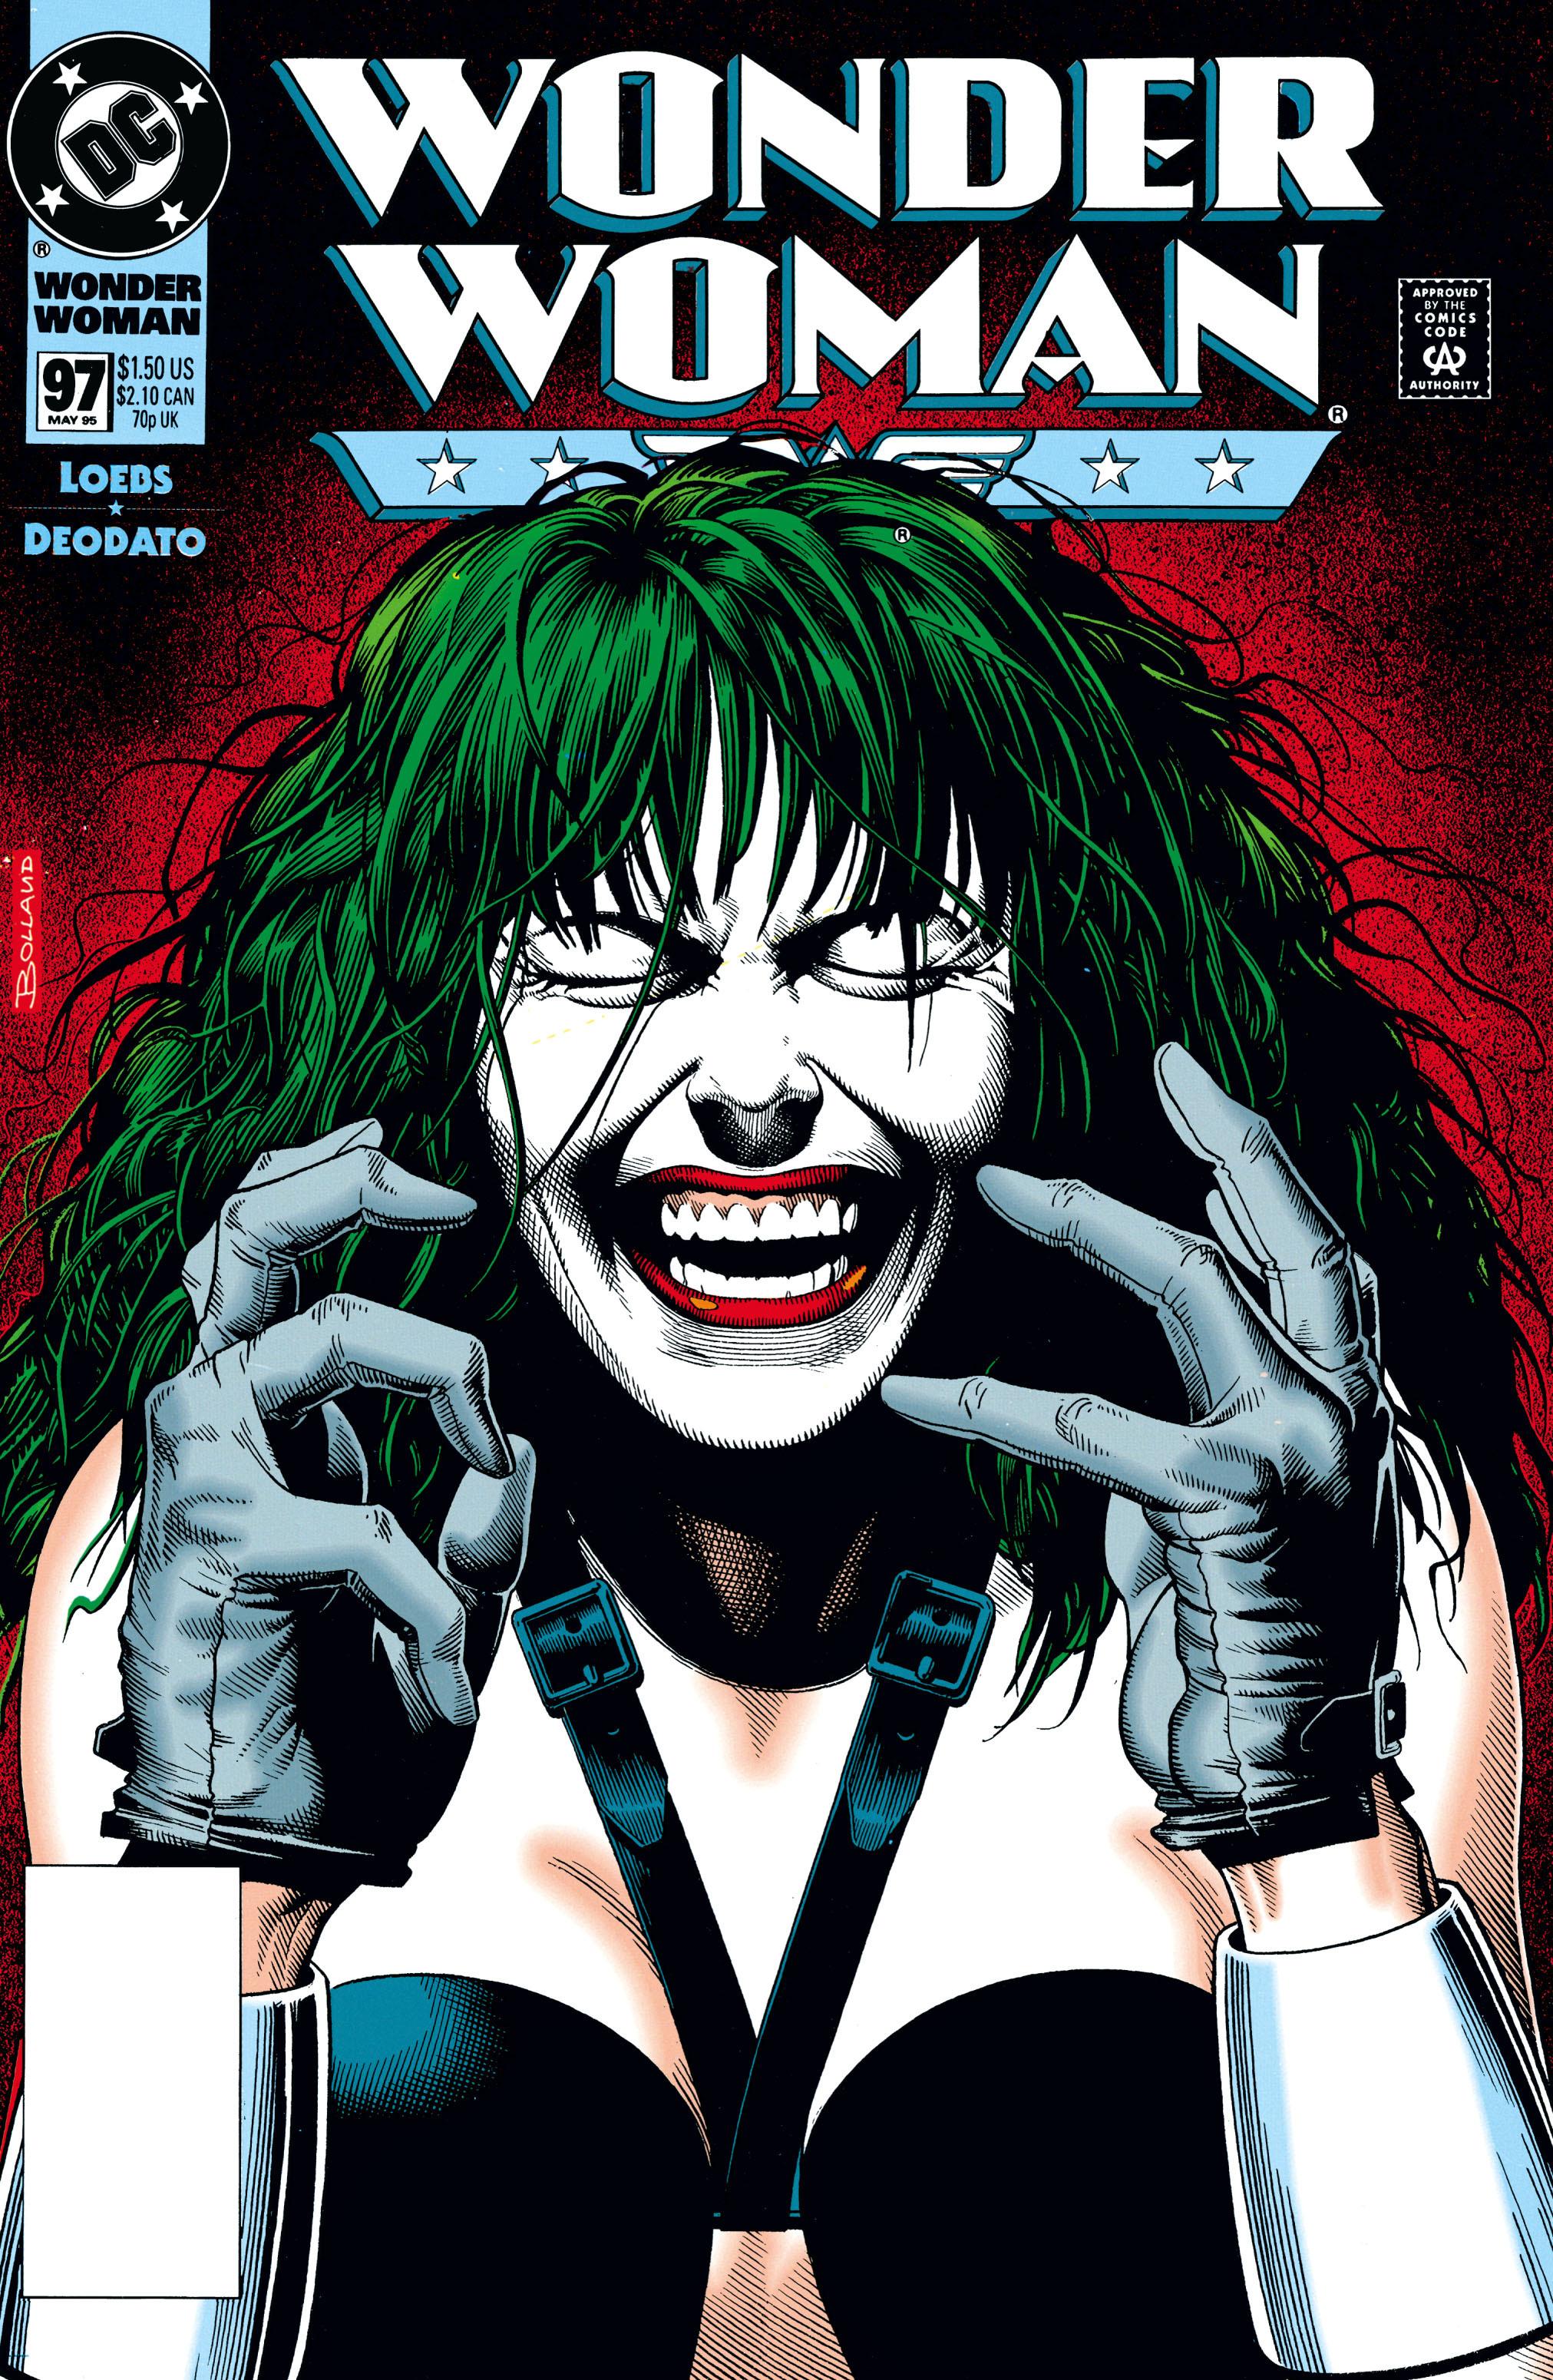 Read online Wonder Woman (1987) comic -  Issue #97 - 1